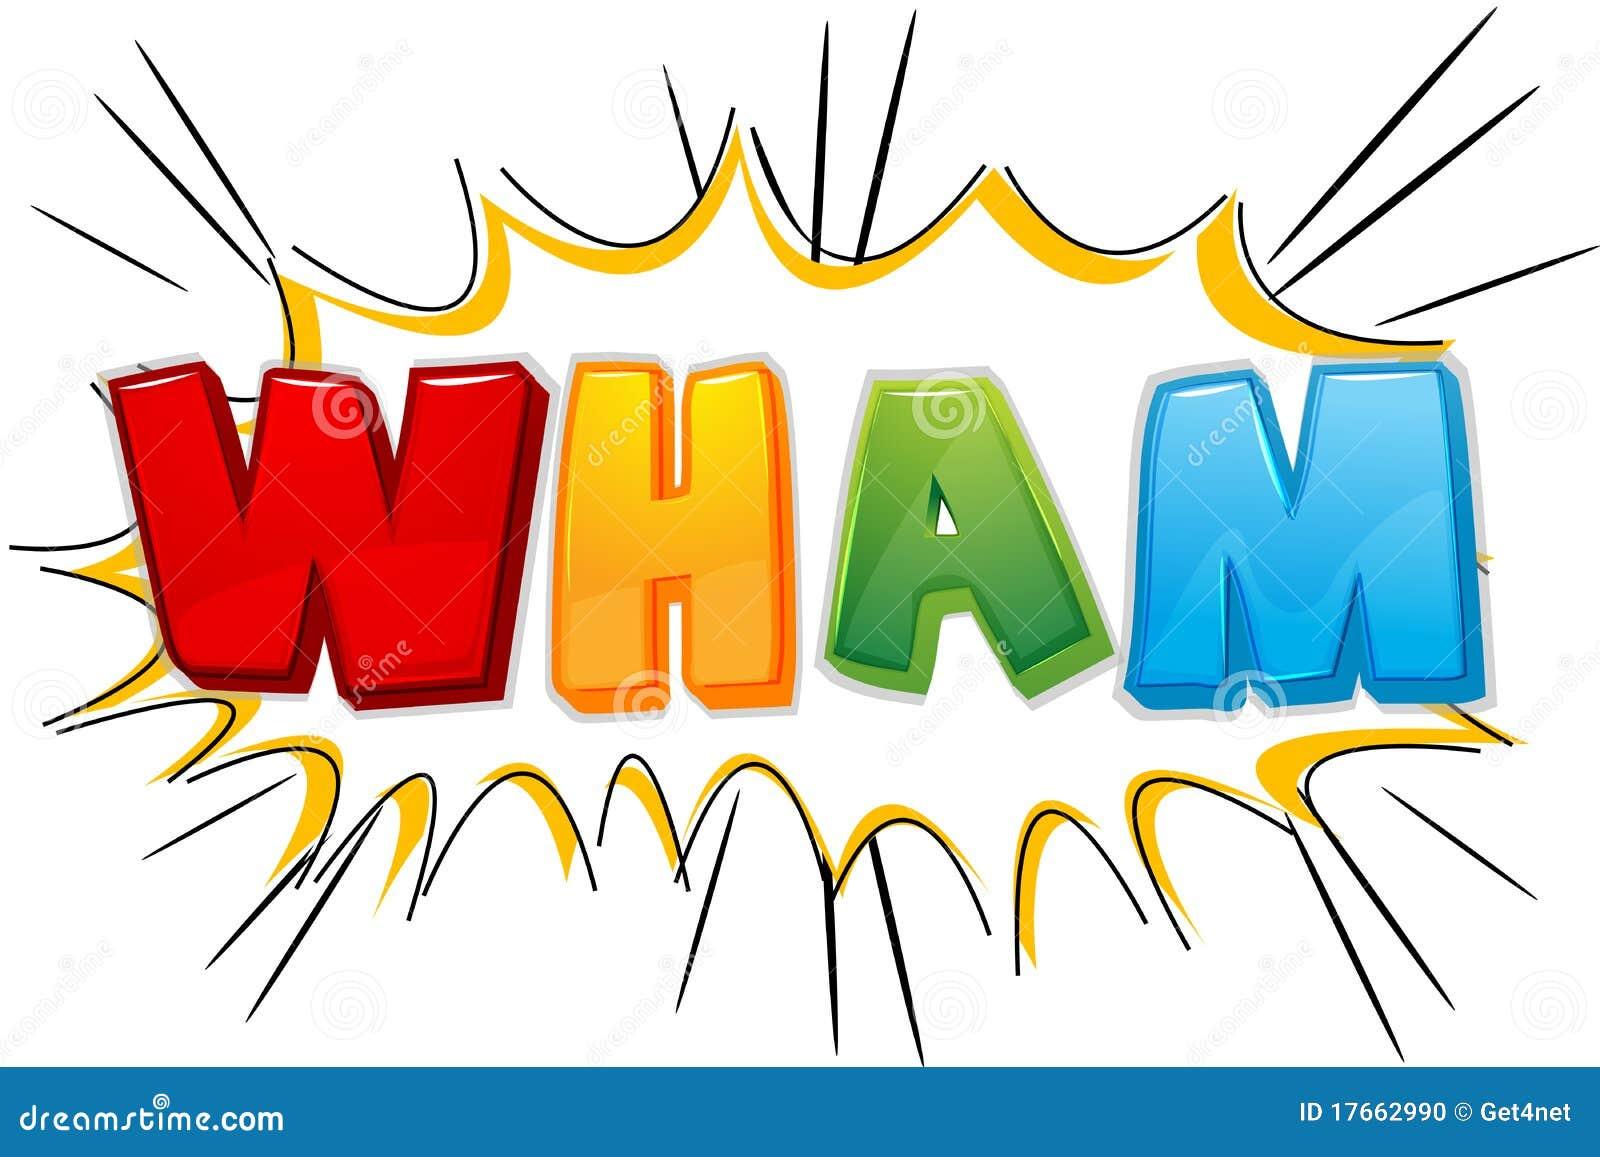 Wham business plan